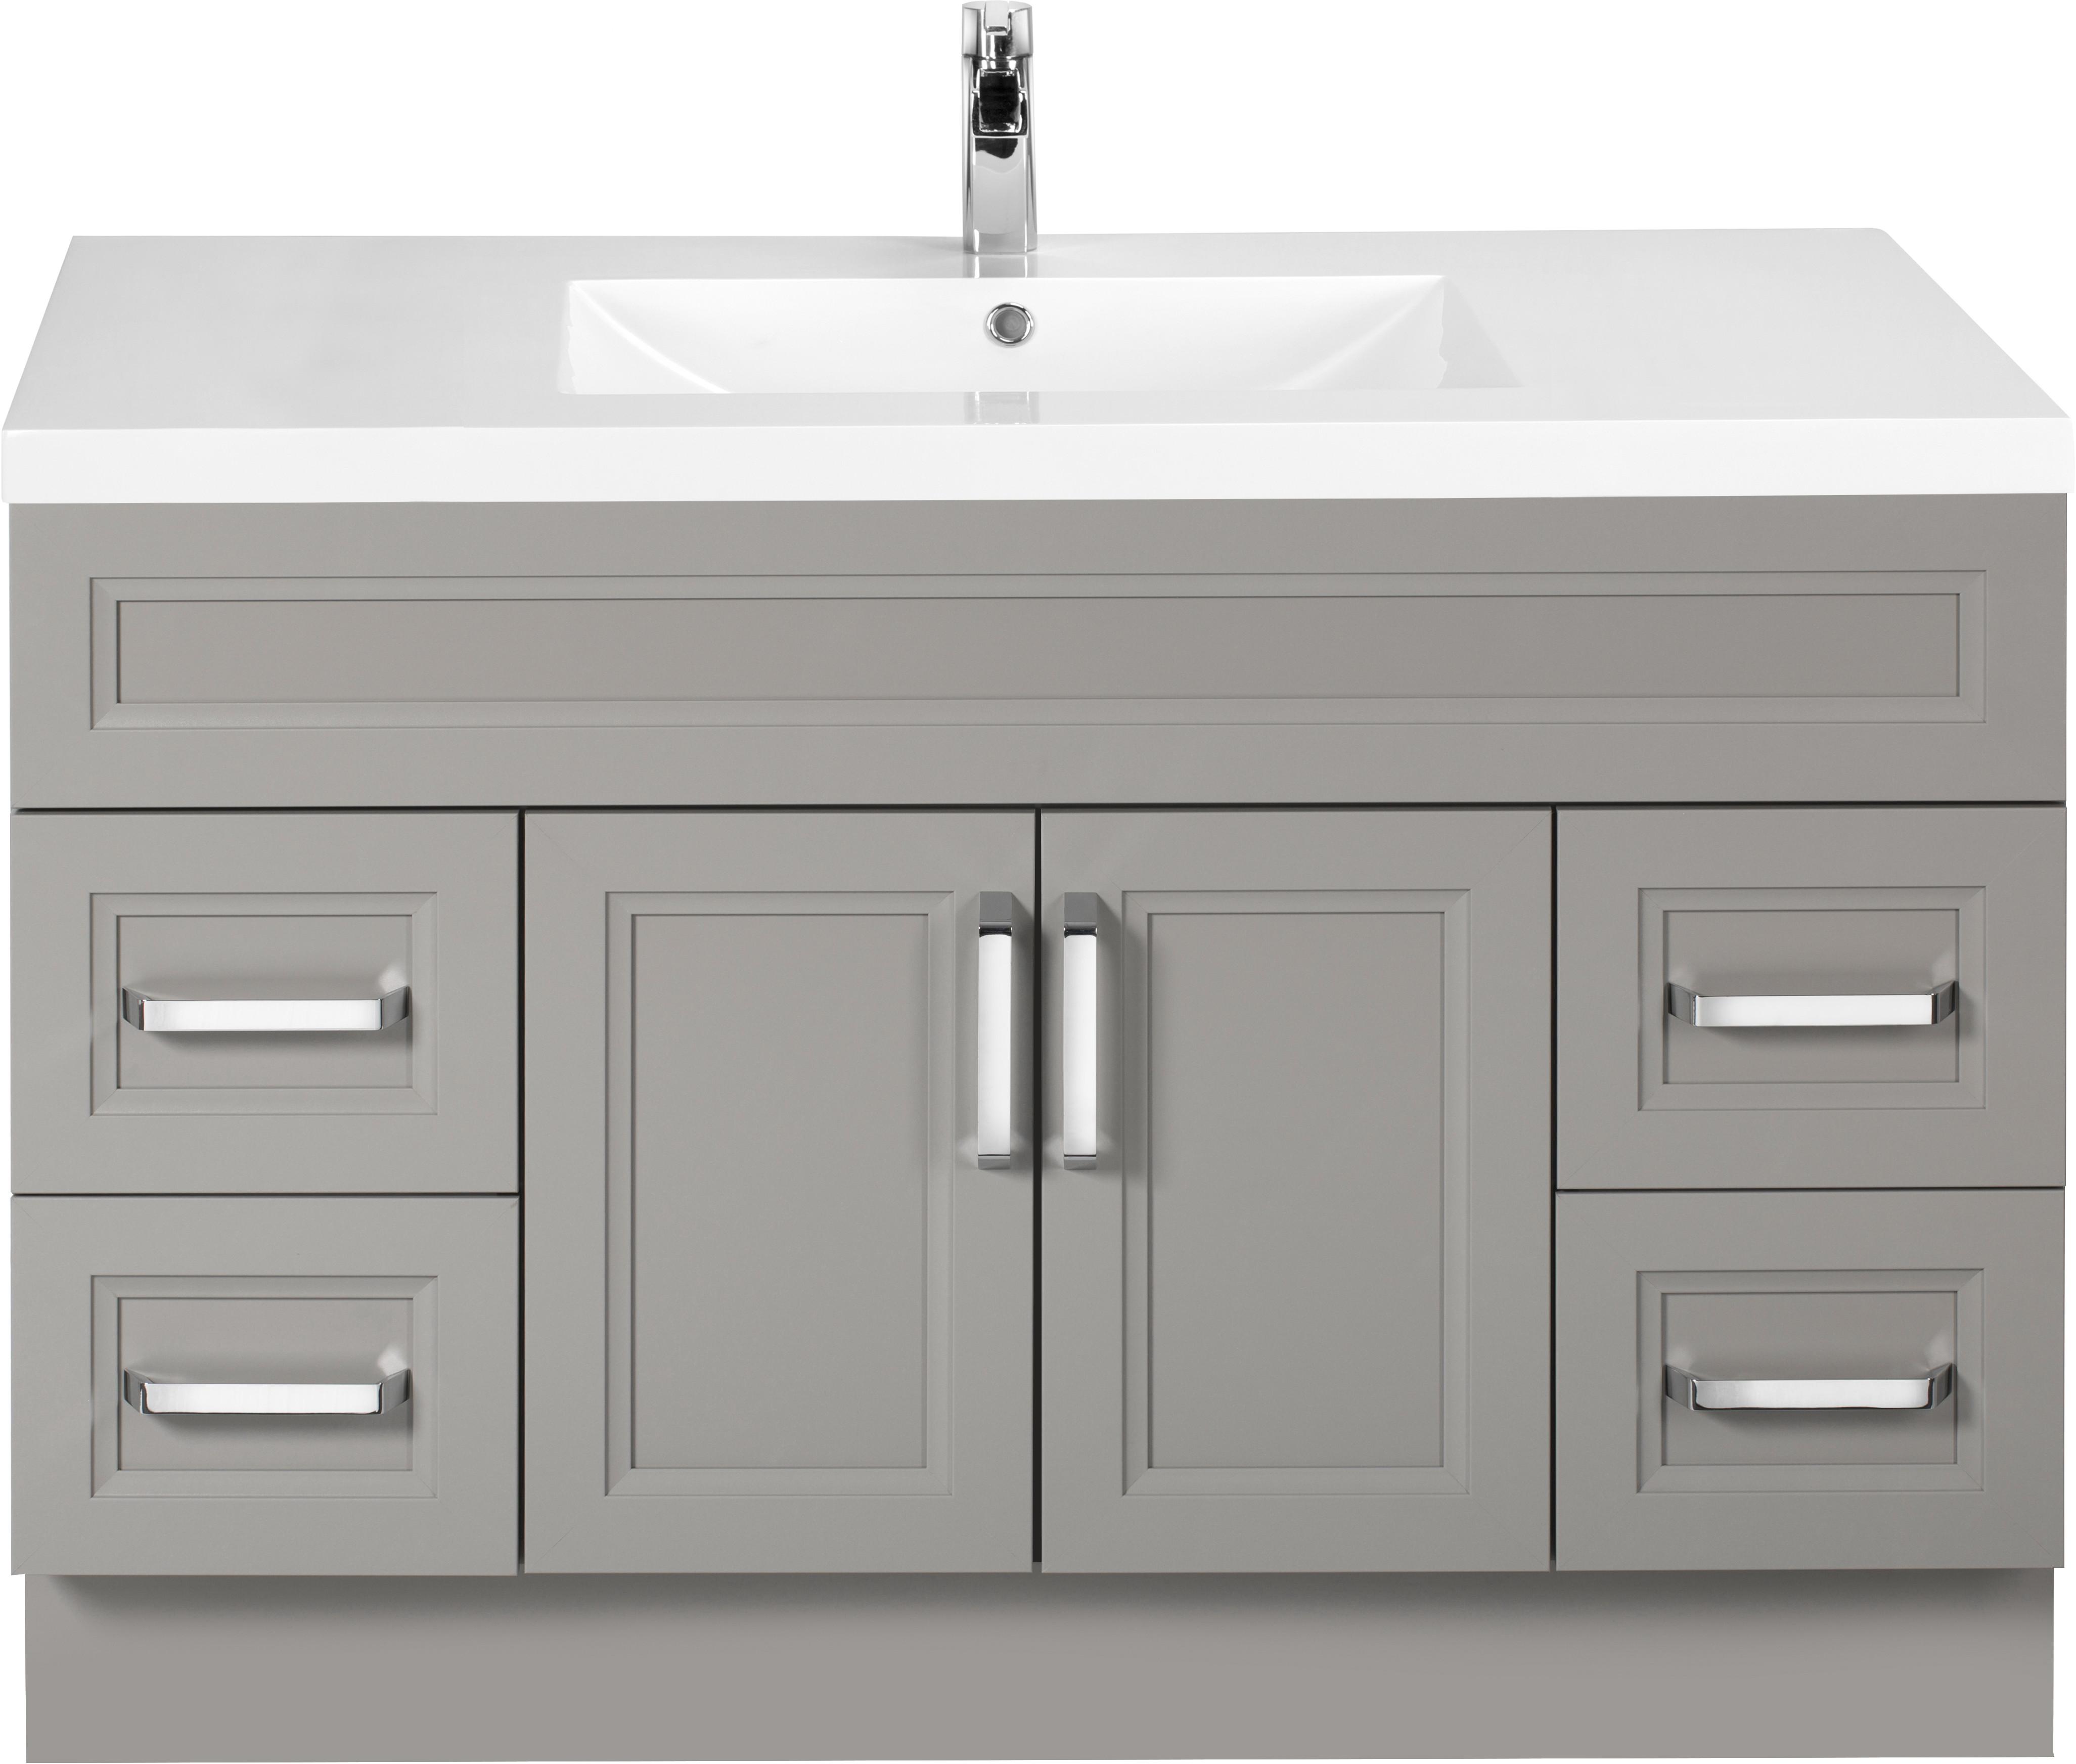 cutler kitchen bath urban urbdb48sbt